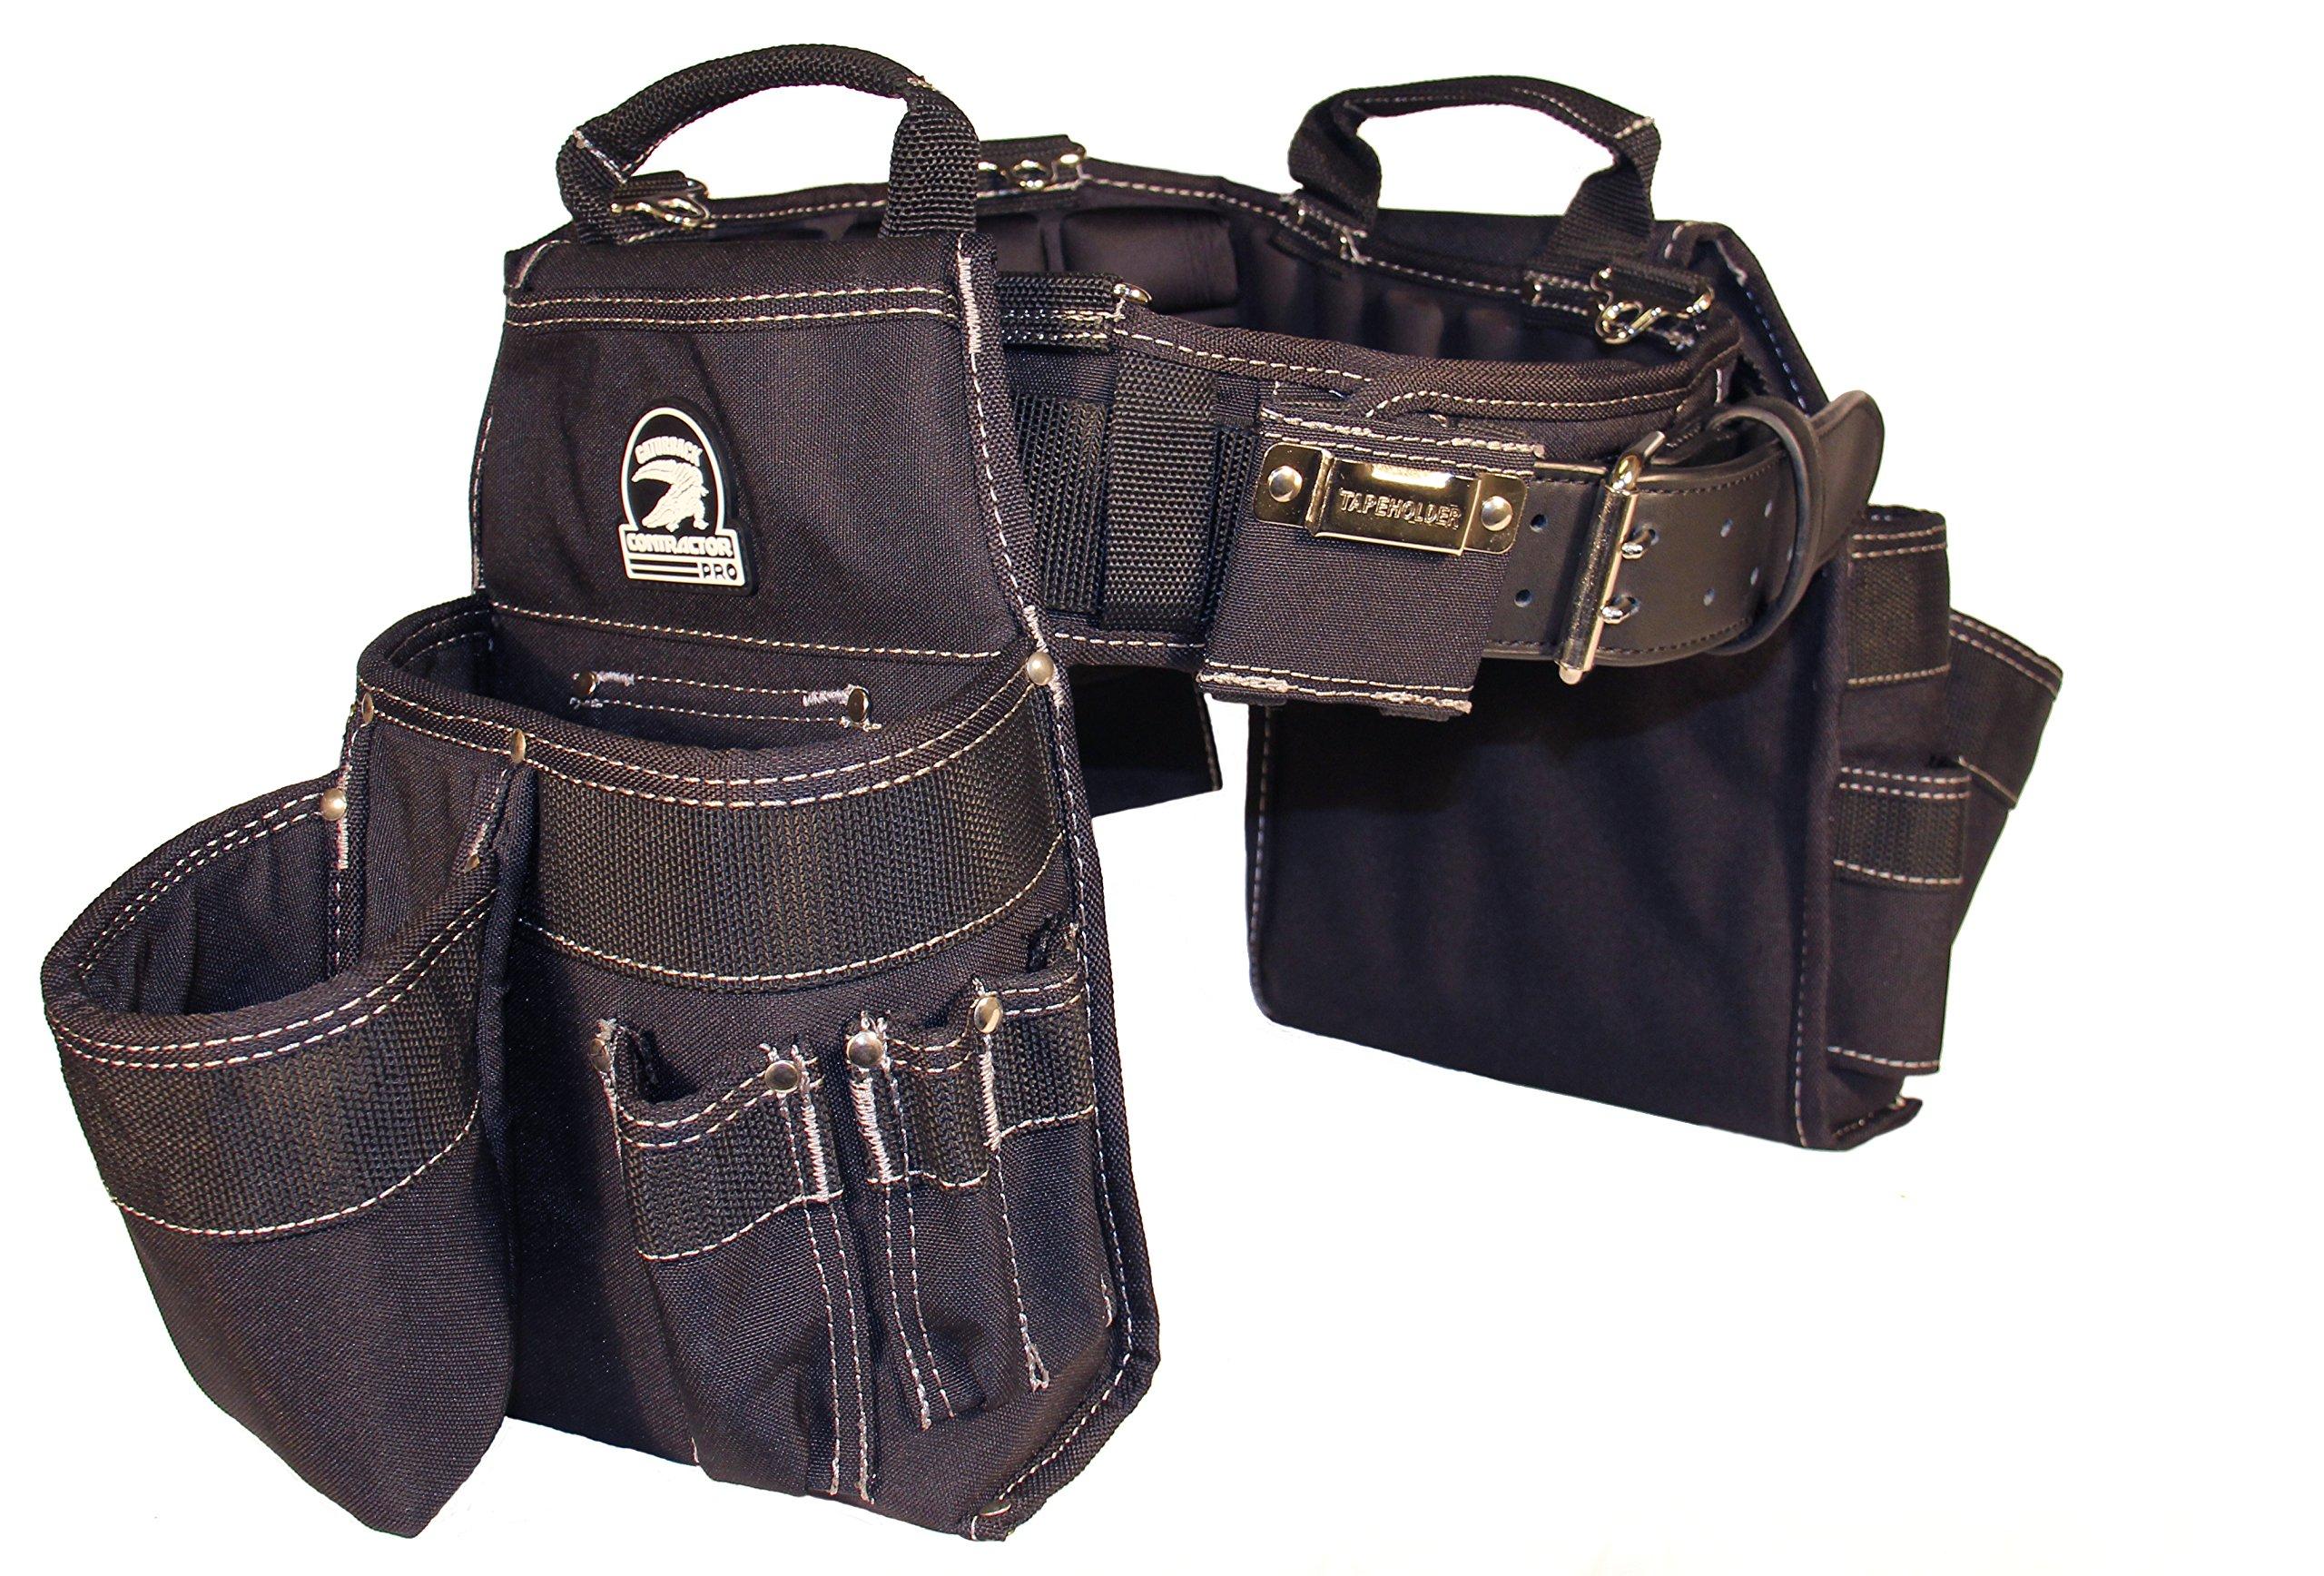 Gatorback Professional Carpenter's Tool Belt Combo w/Air-Channel Pro Comfort Back Support Belt. (Large 36-40 Inch Waist)